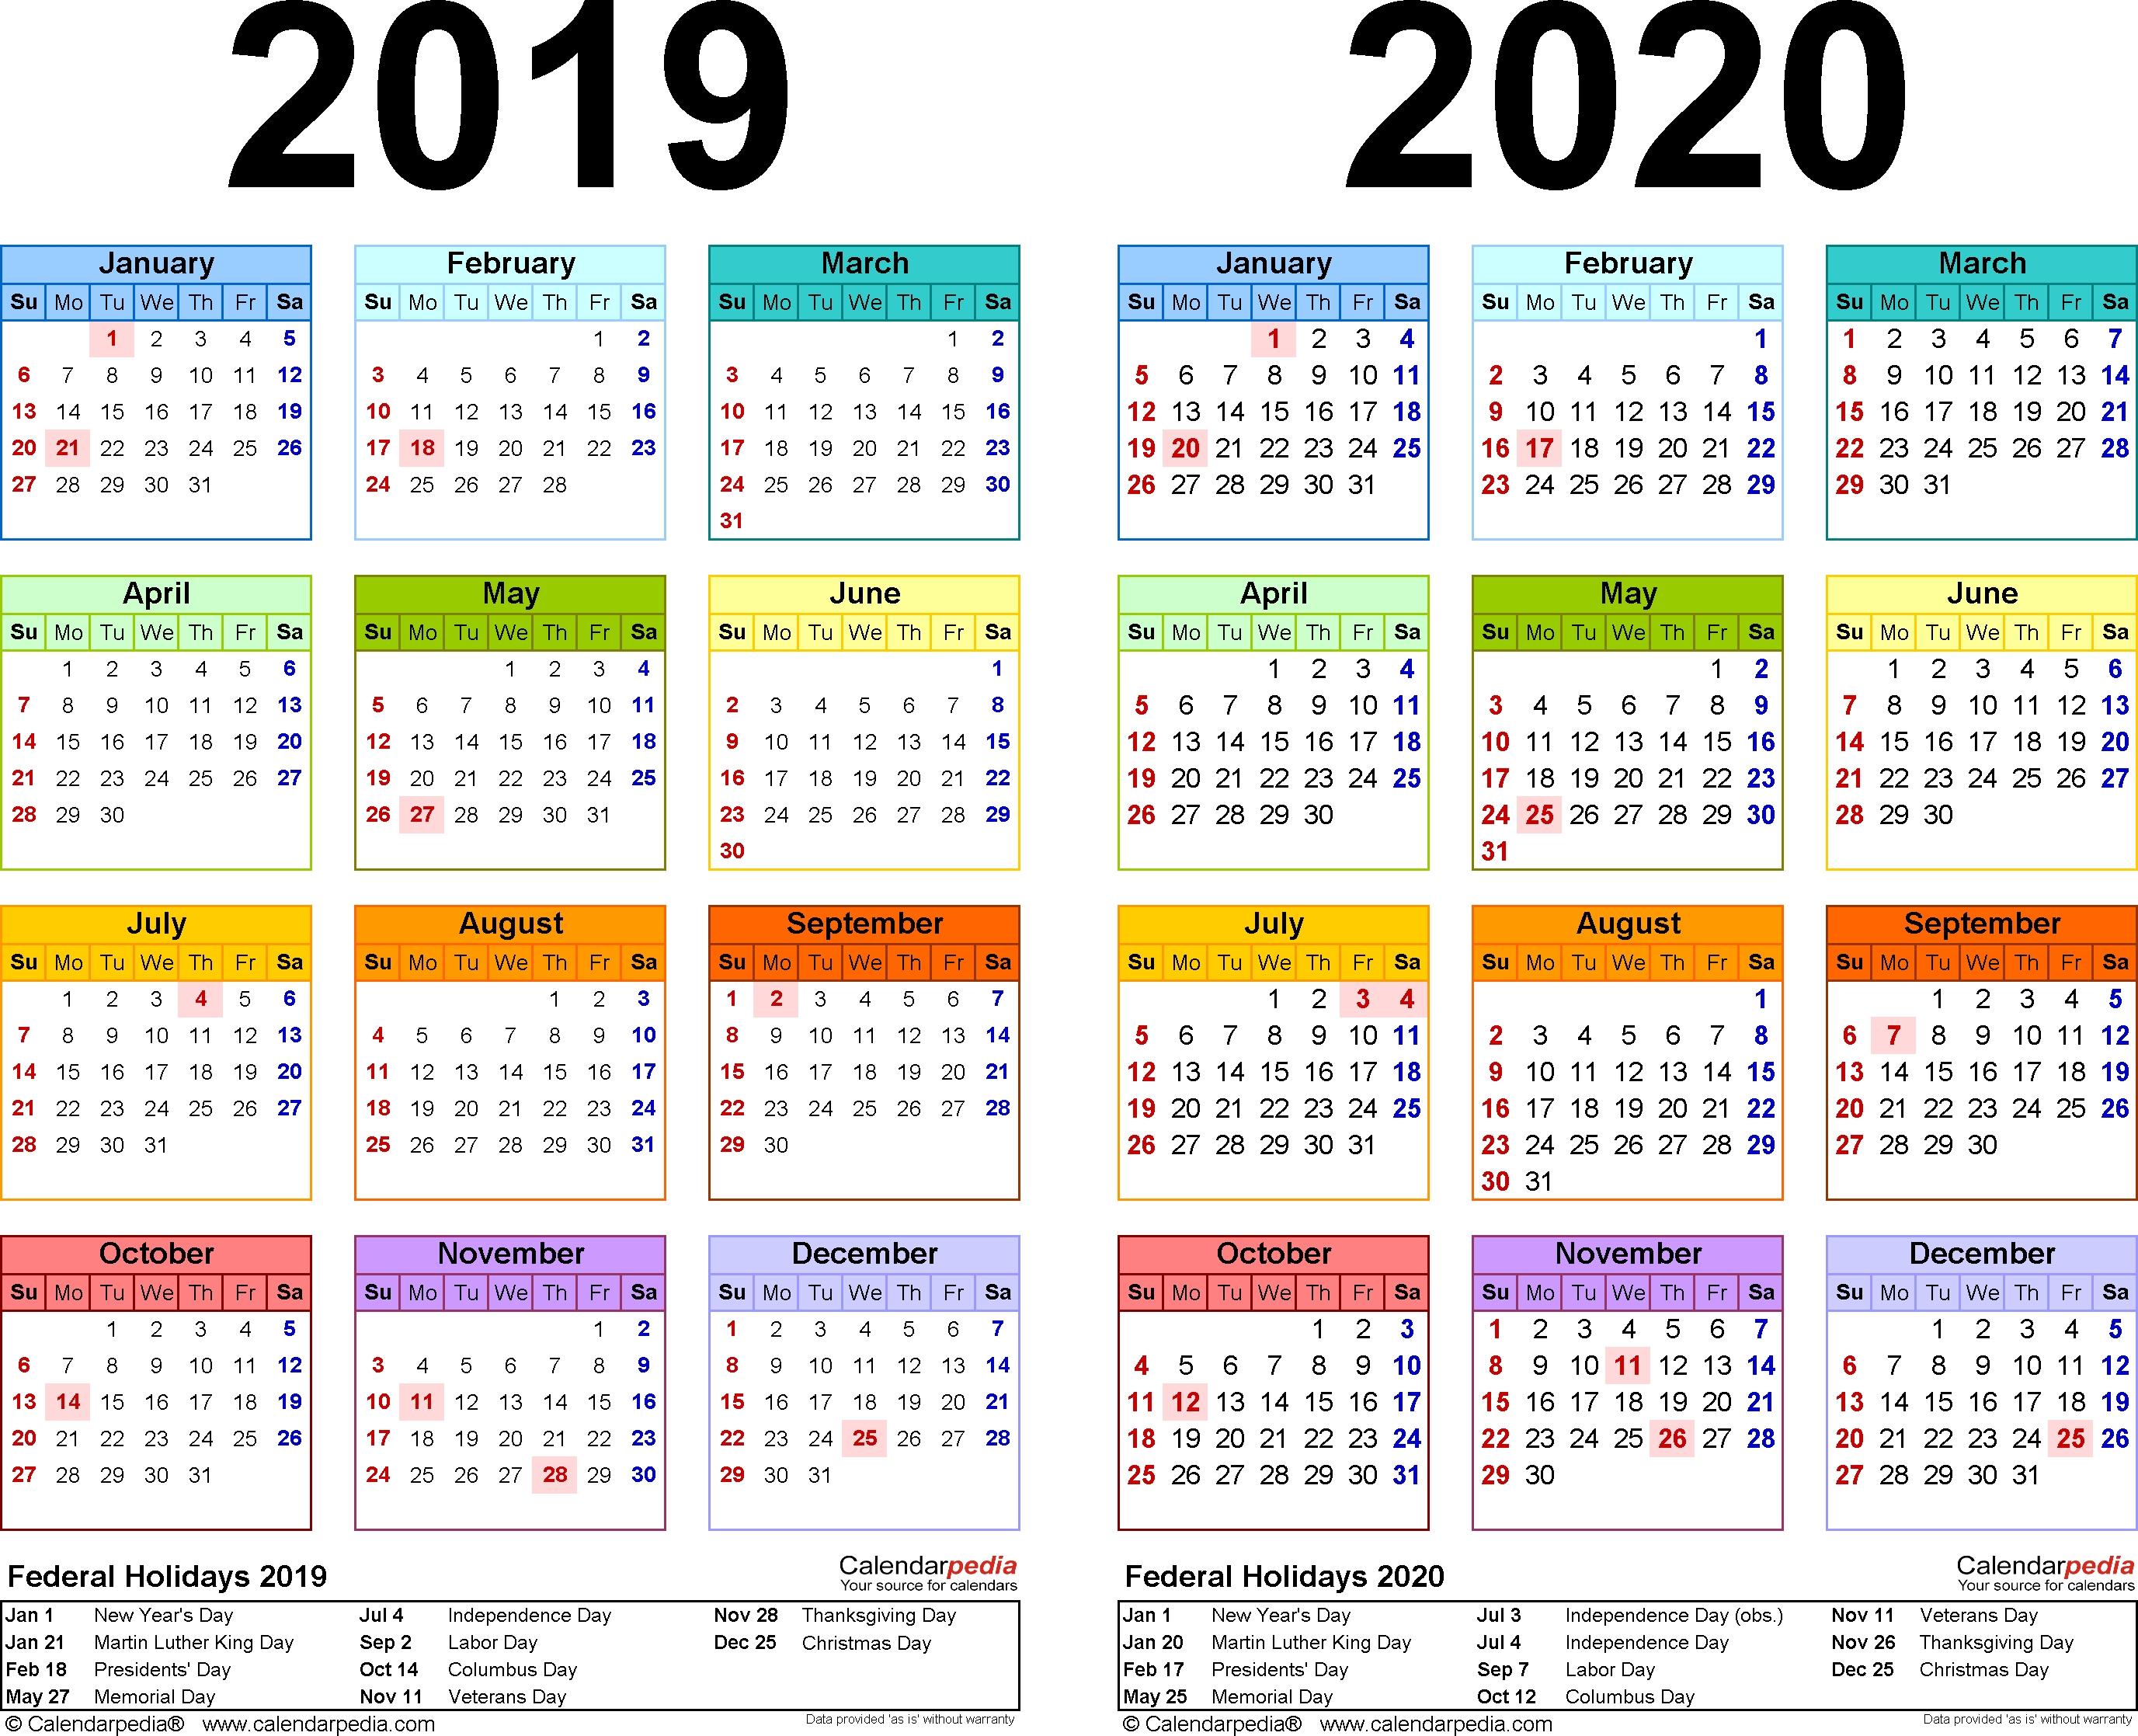 2019-2020 Calendar - Free Printable Two-Year Pdf Calendars pertaining to 2019-2020 Calendar Starting On Mondays